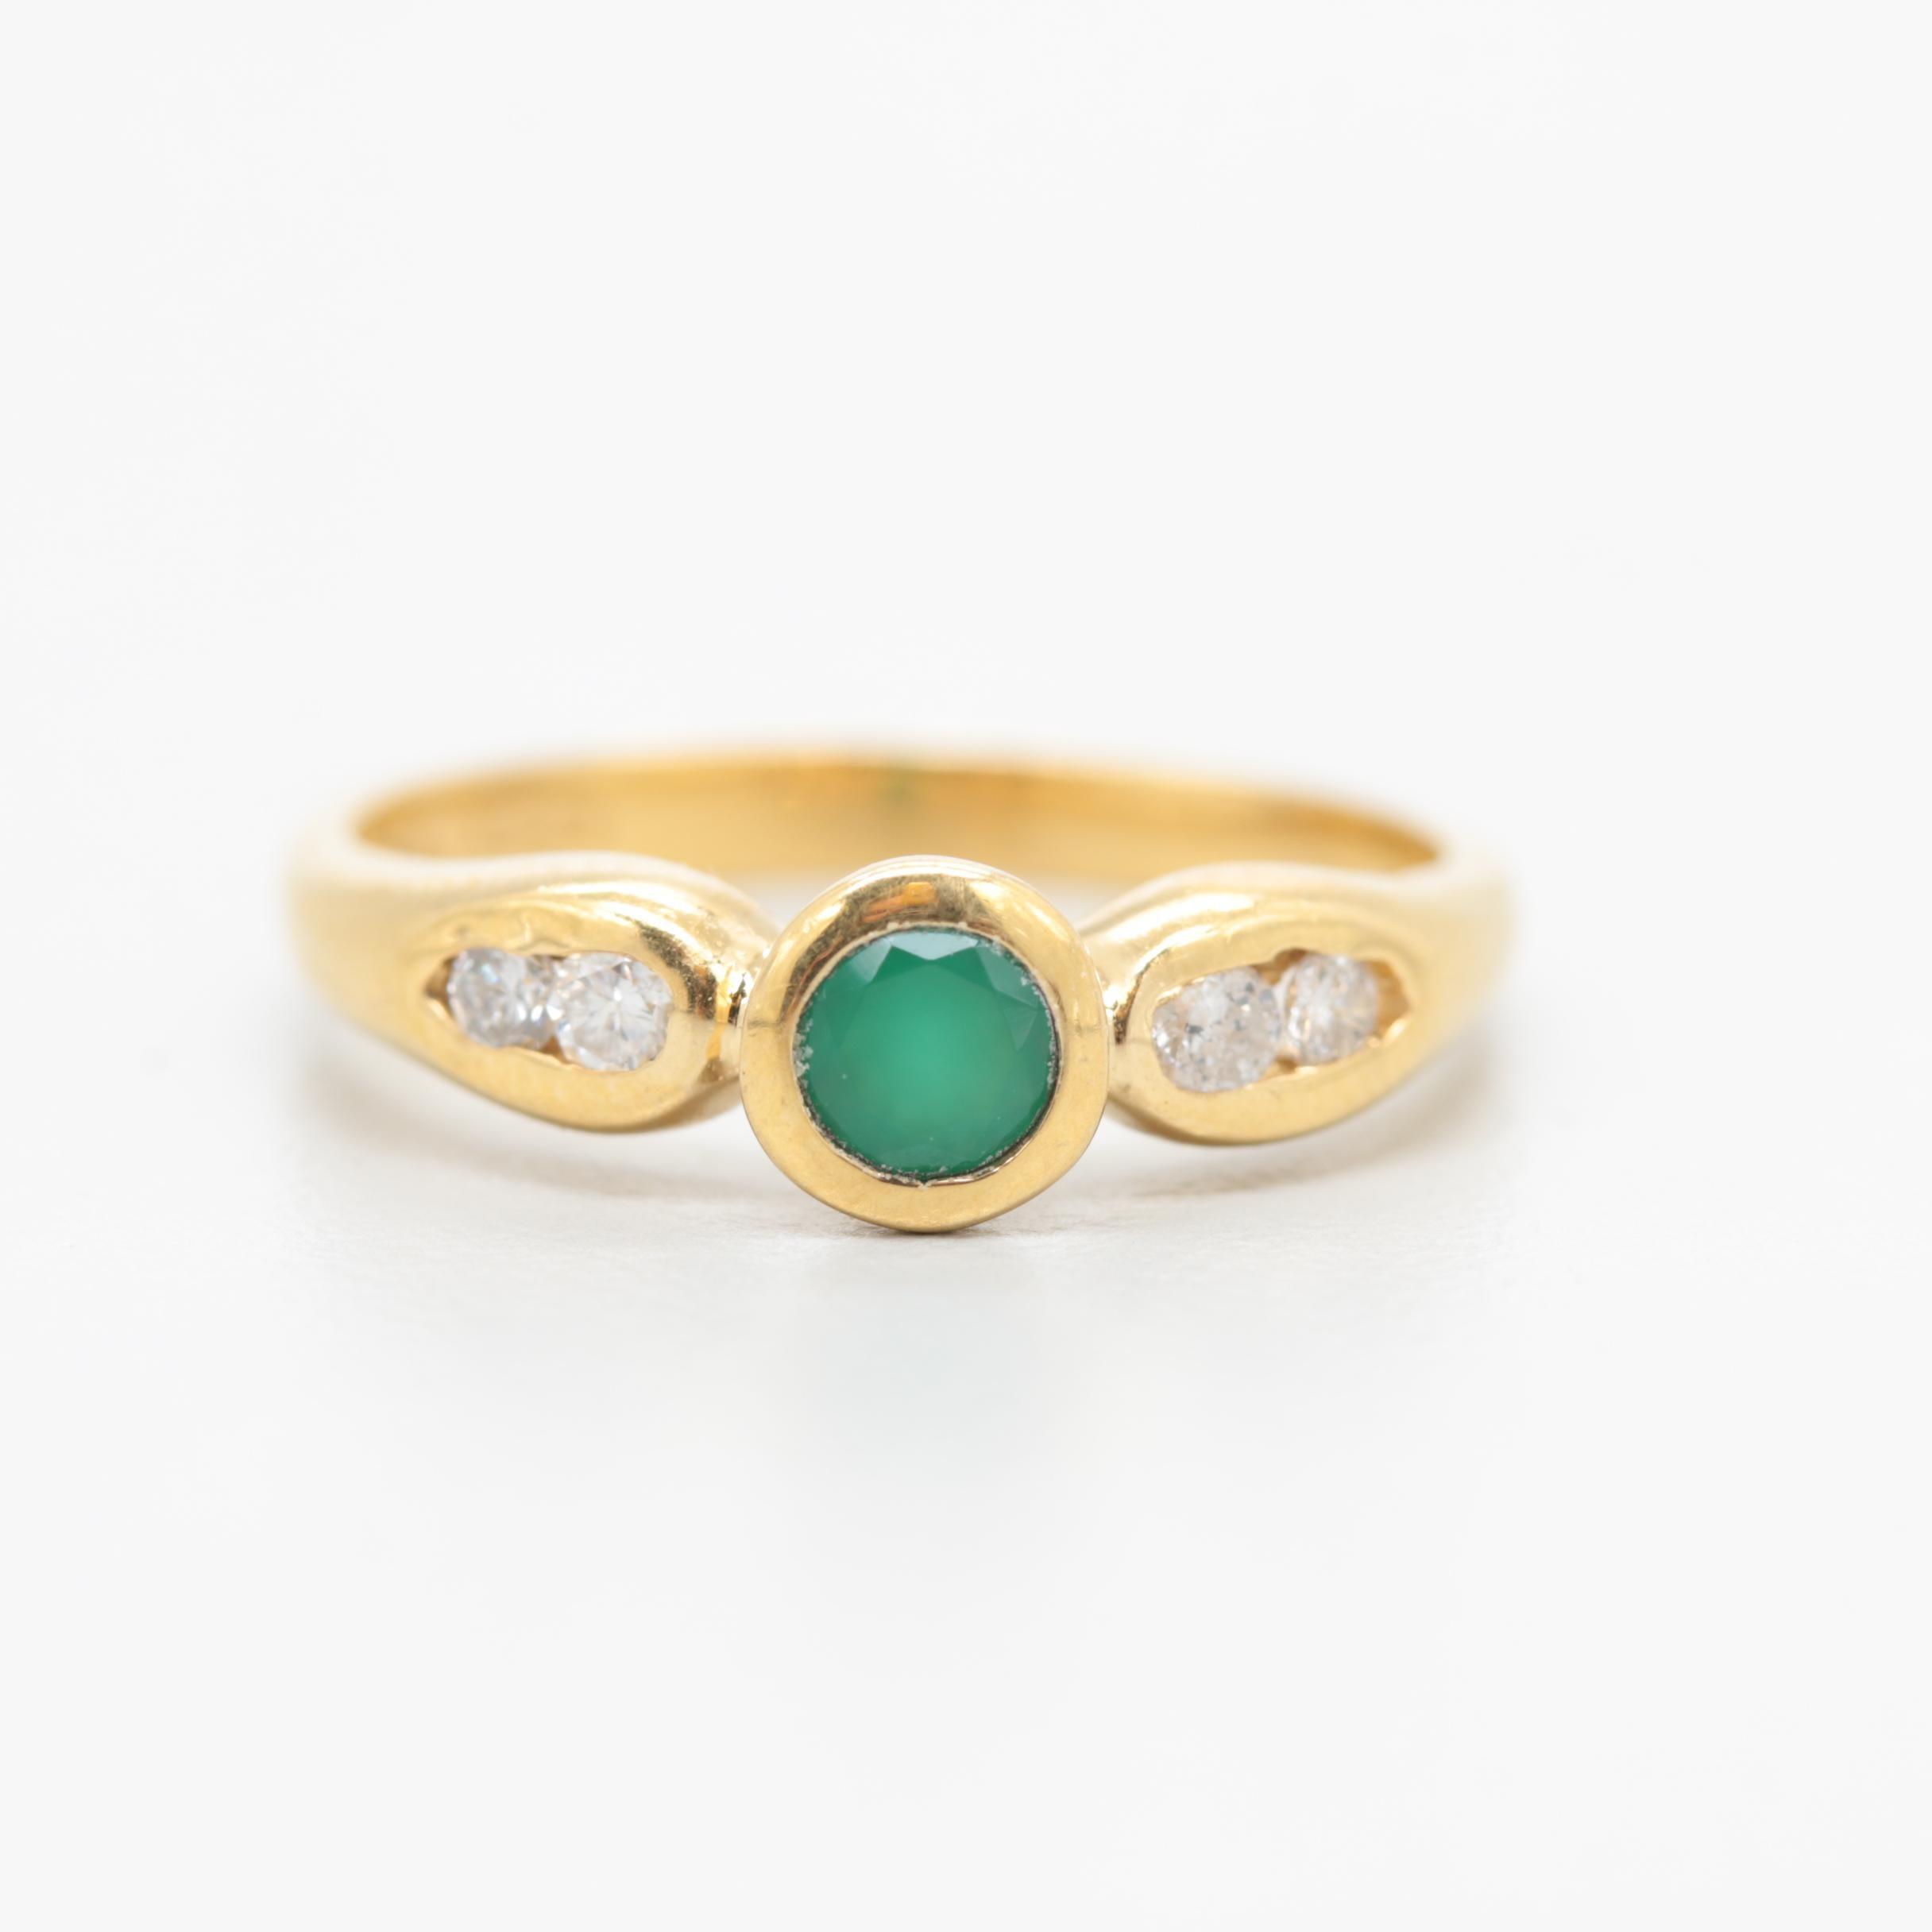 18K Yellow Gold Chalcedony and Diamond Ring